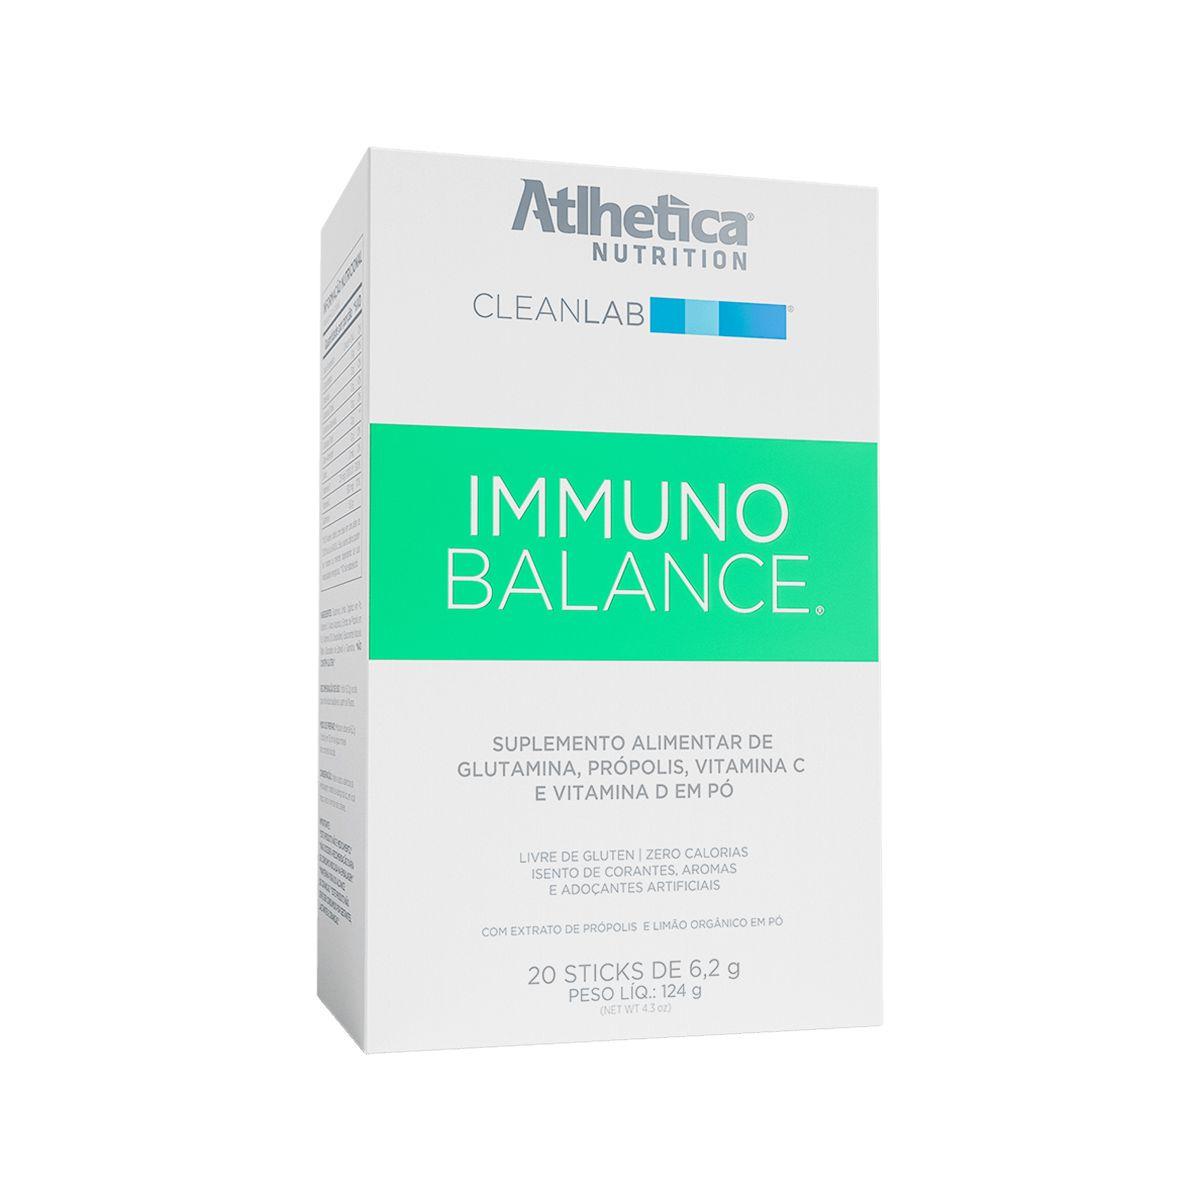 Cleanlab Immuno Balance - 20 Sticks de 6,2g - Atlhetica Nutrition